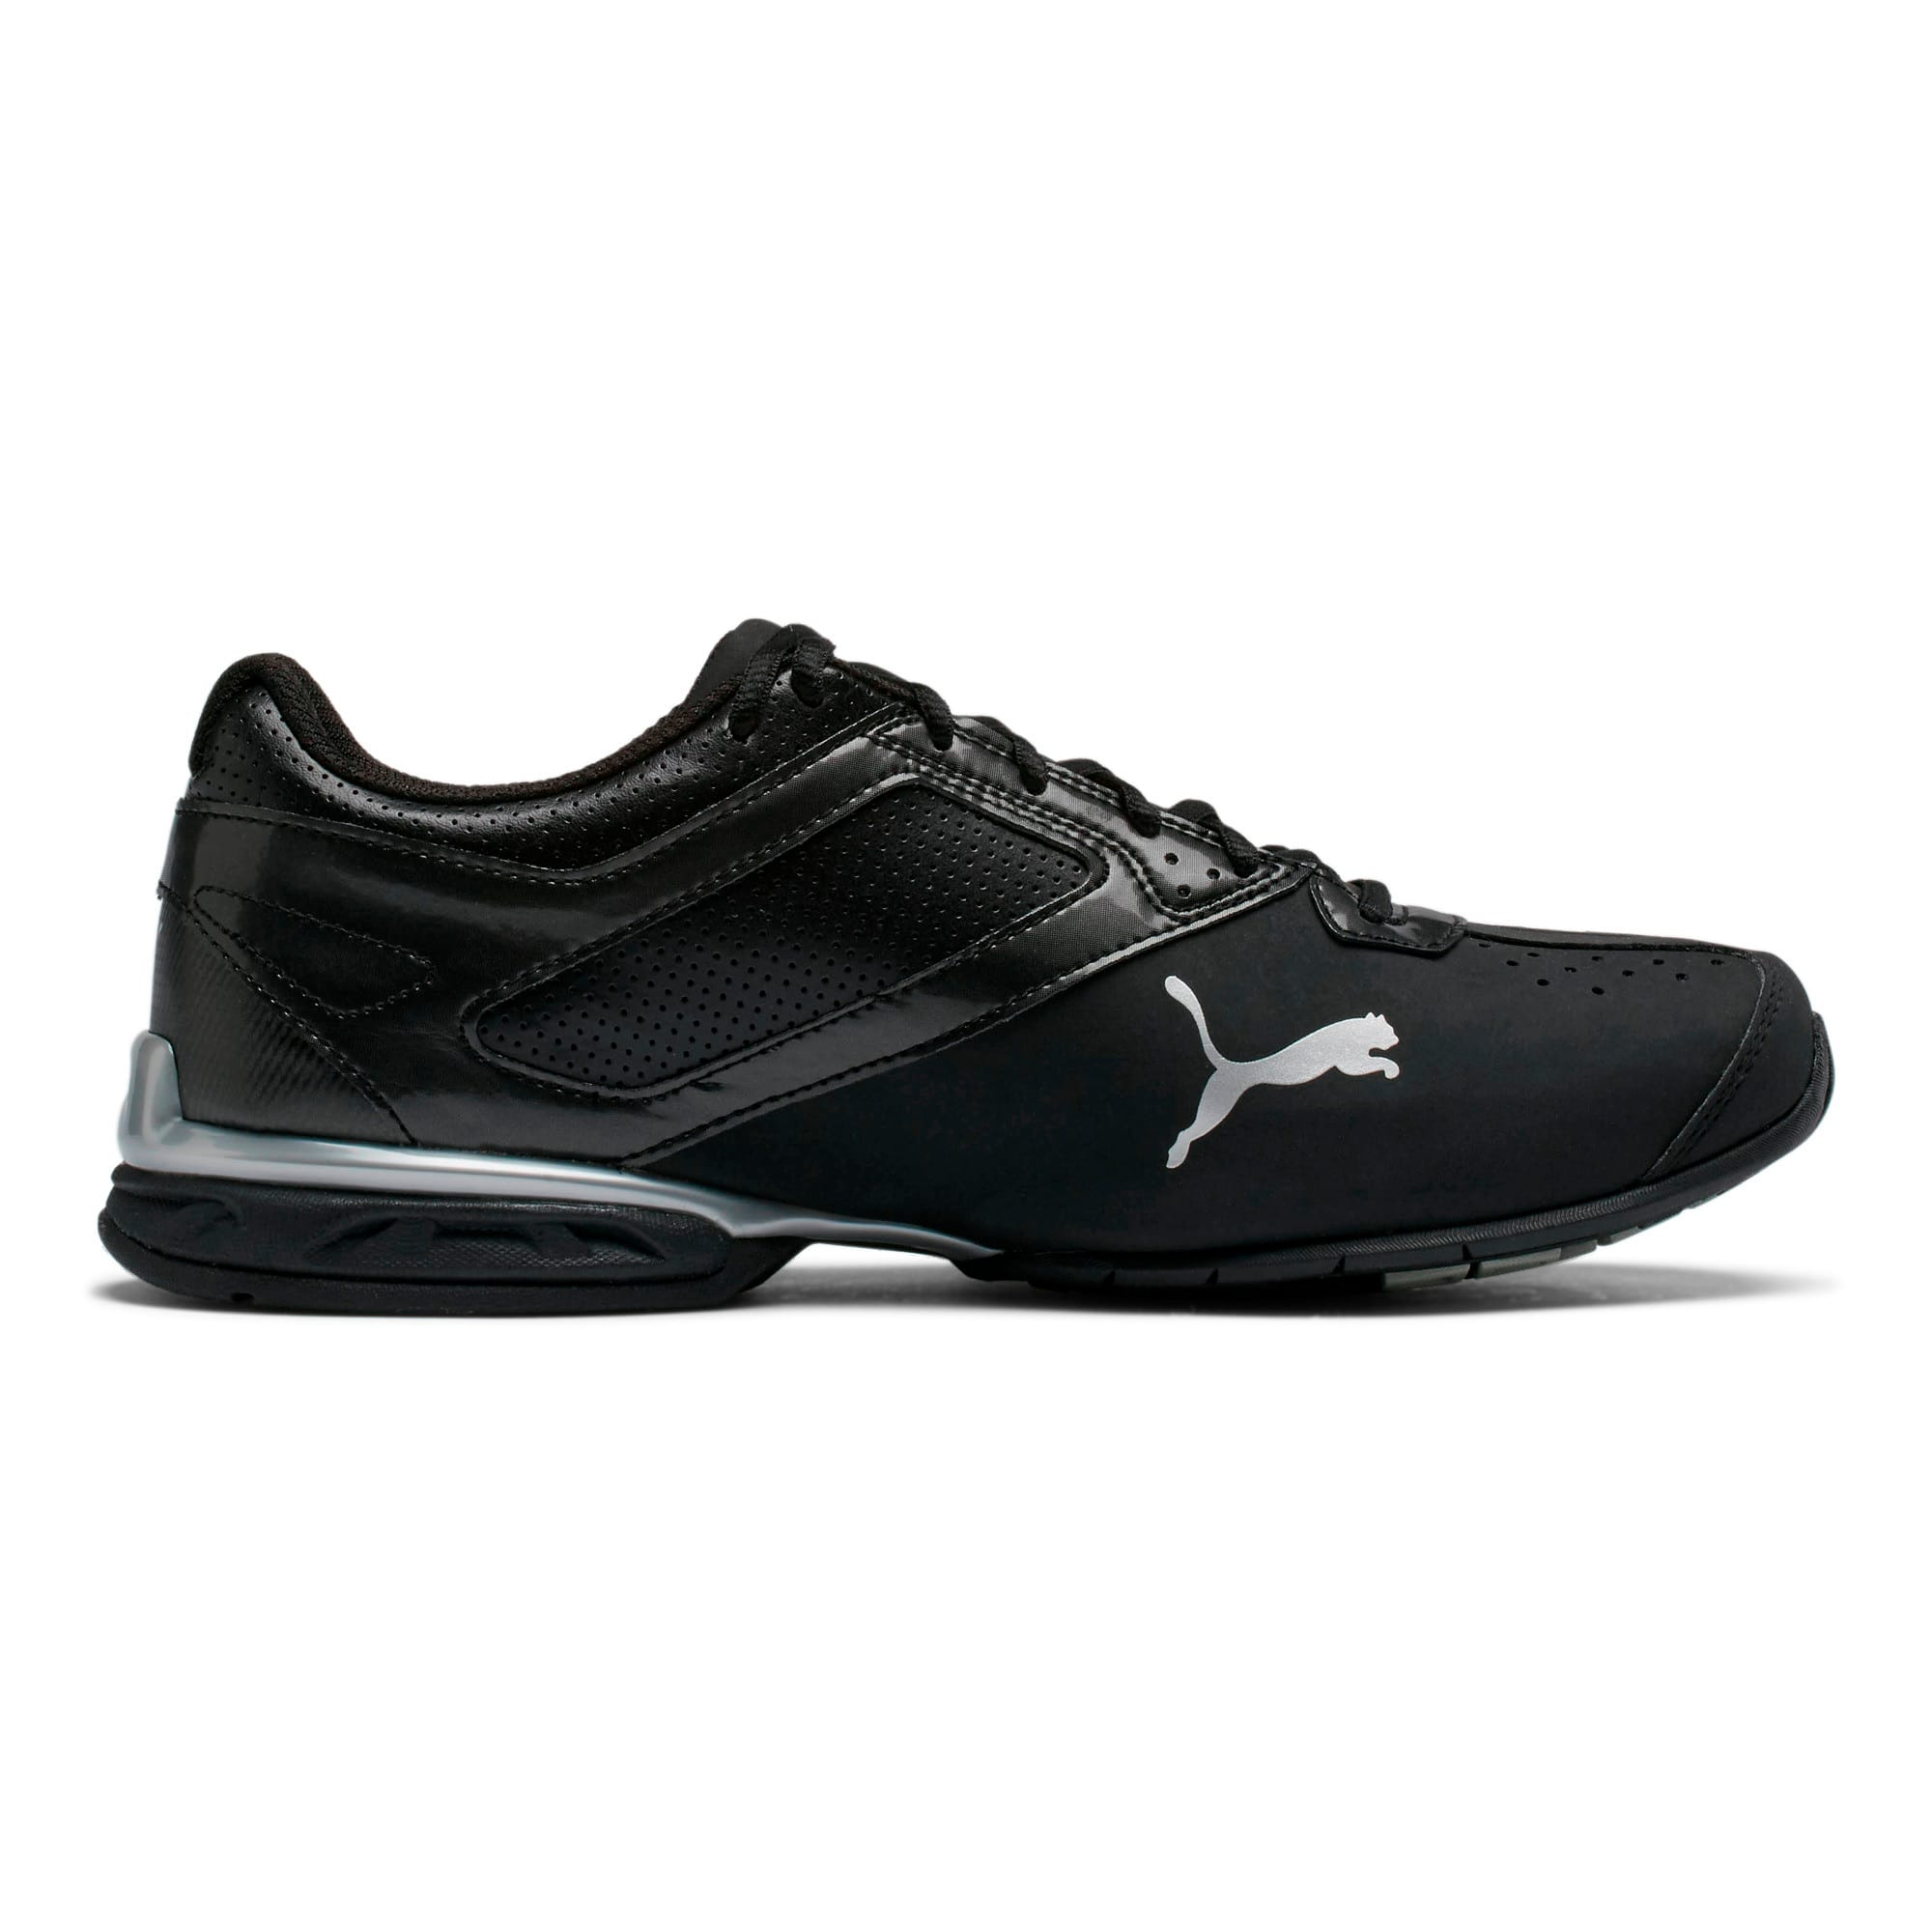 Thumbnail 5 of Tazon 6 FM Men's Sneakers, Puma Black-puma silver, medium